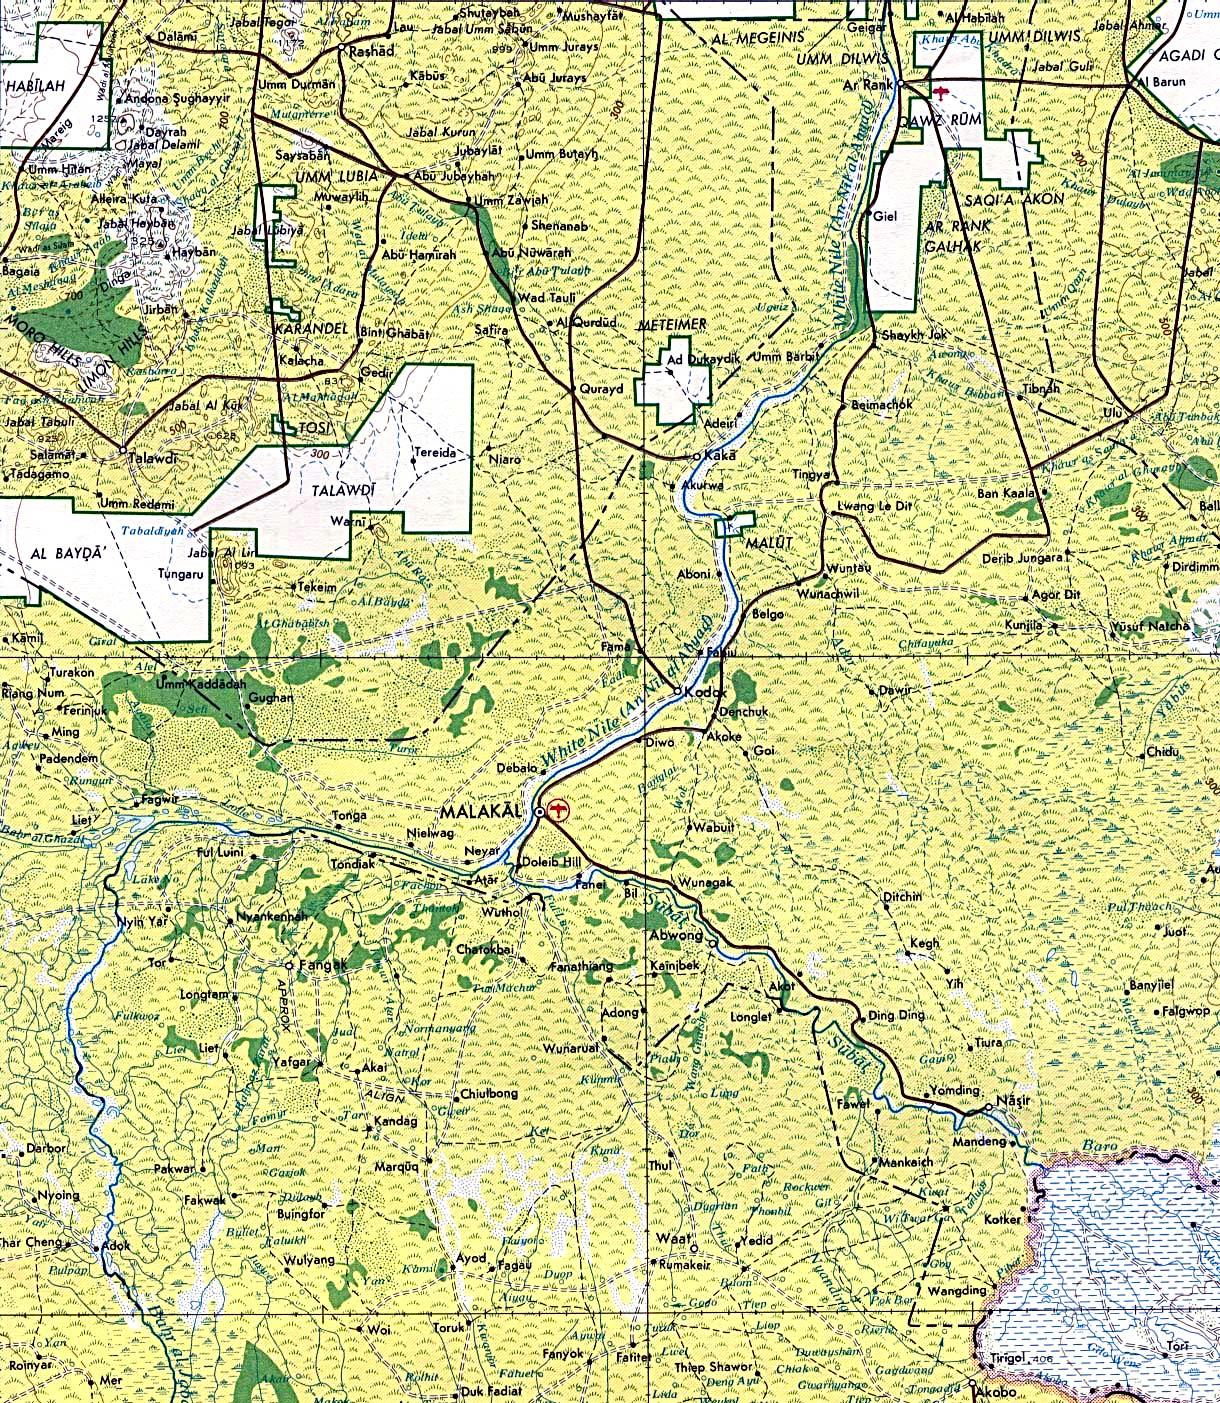 http://www.lib.utexas.edu/maps/africa/sudan_malakal80.jpg